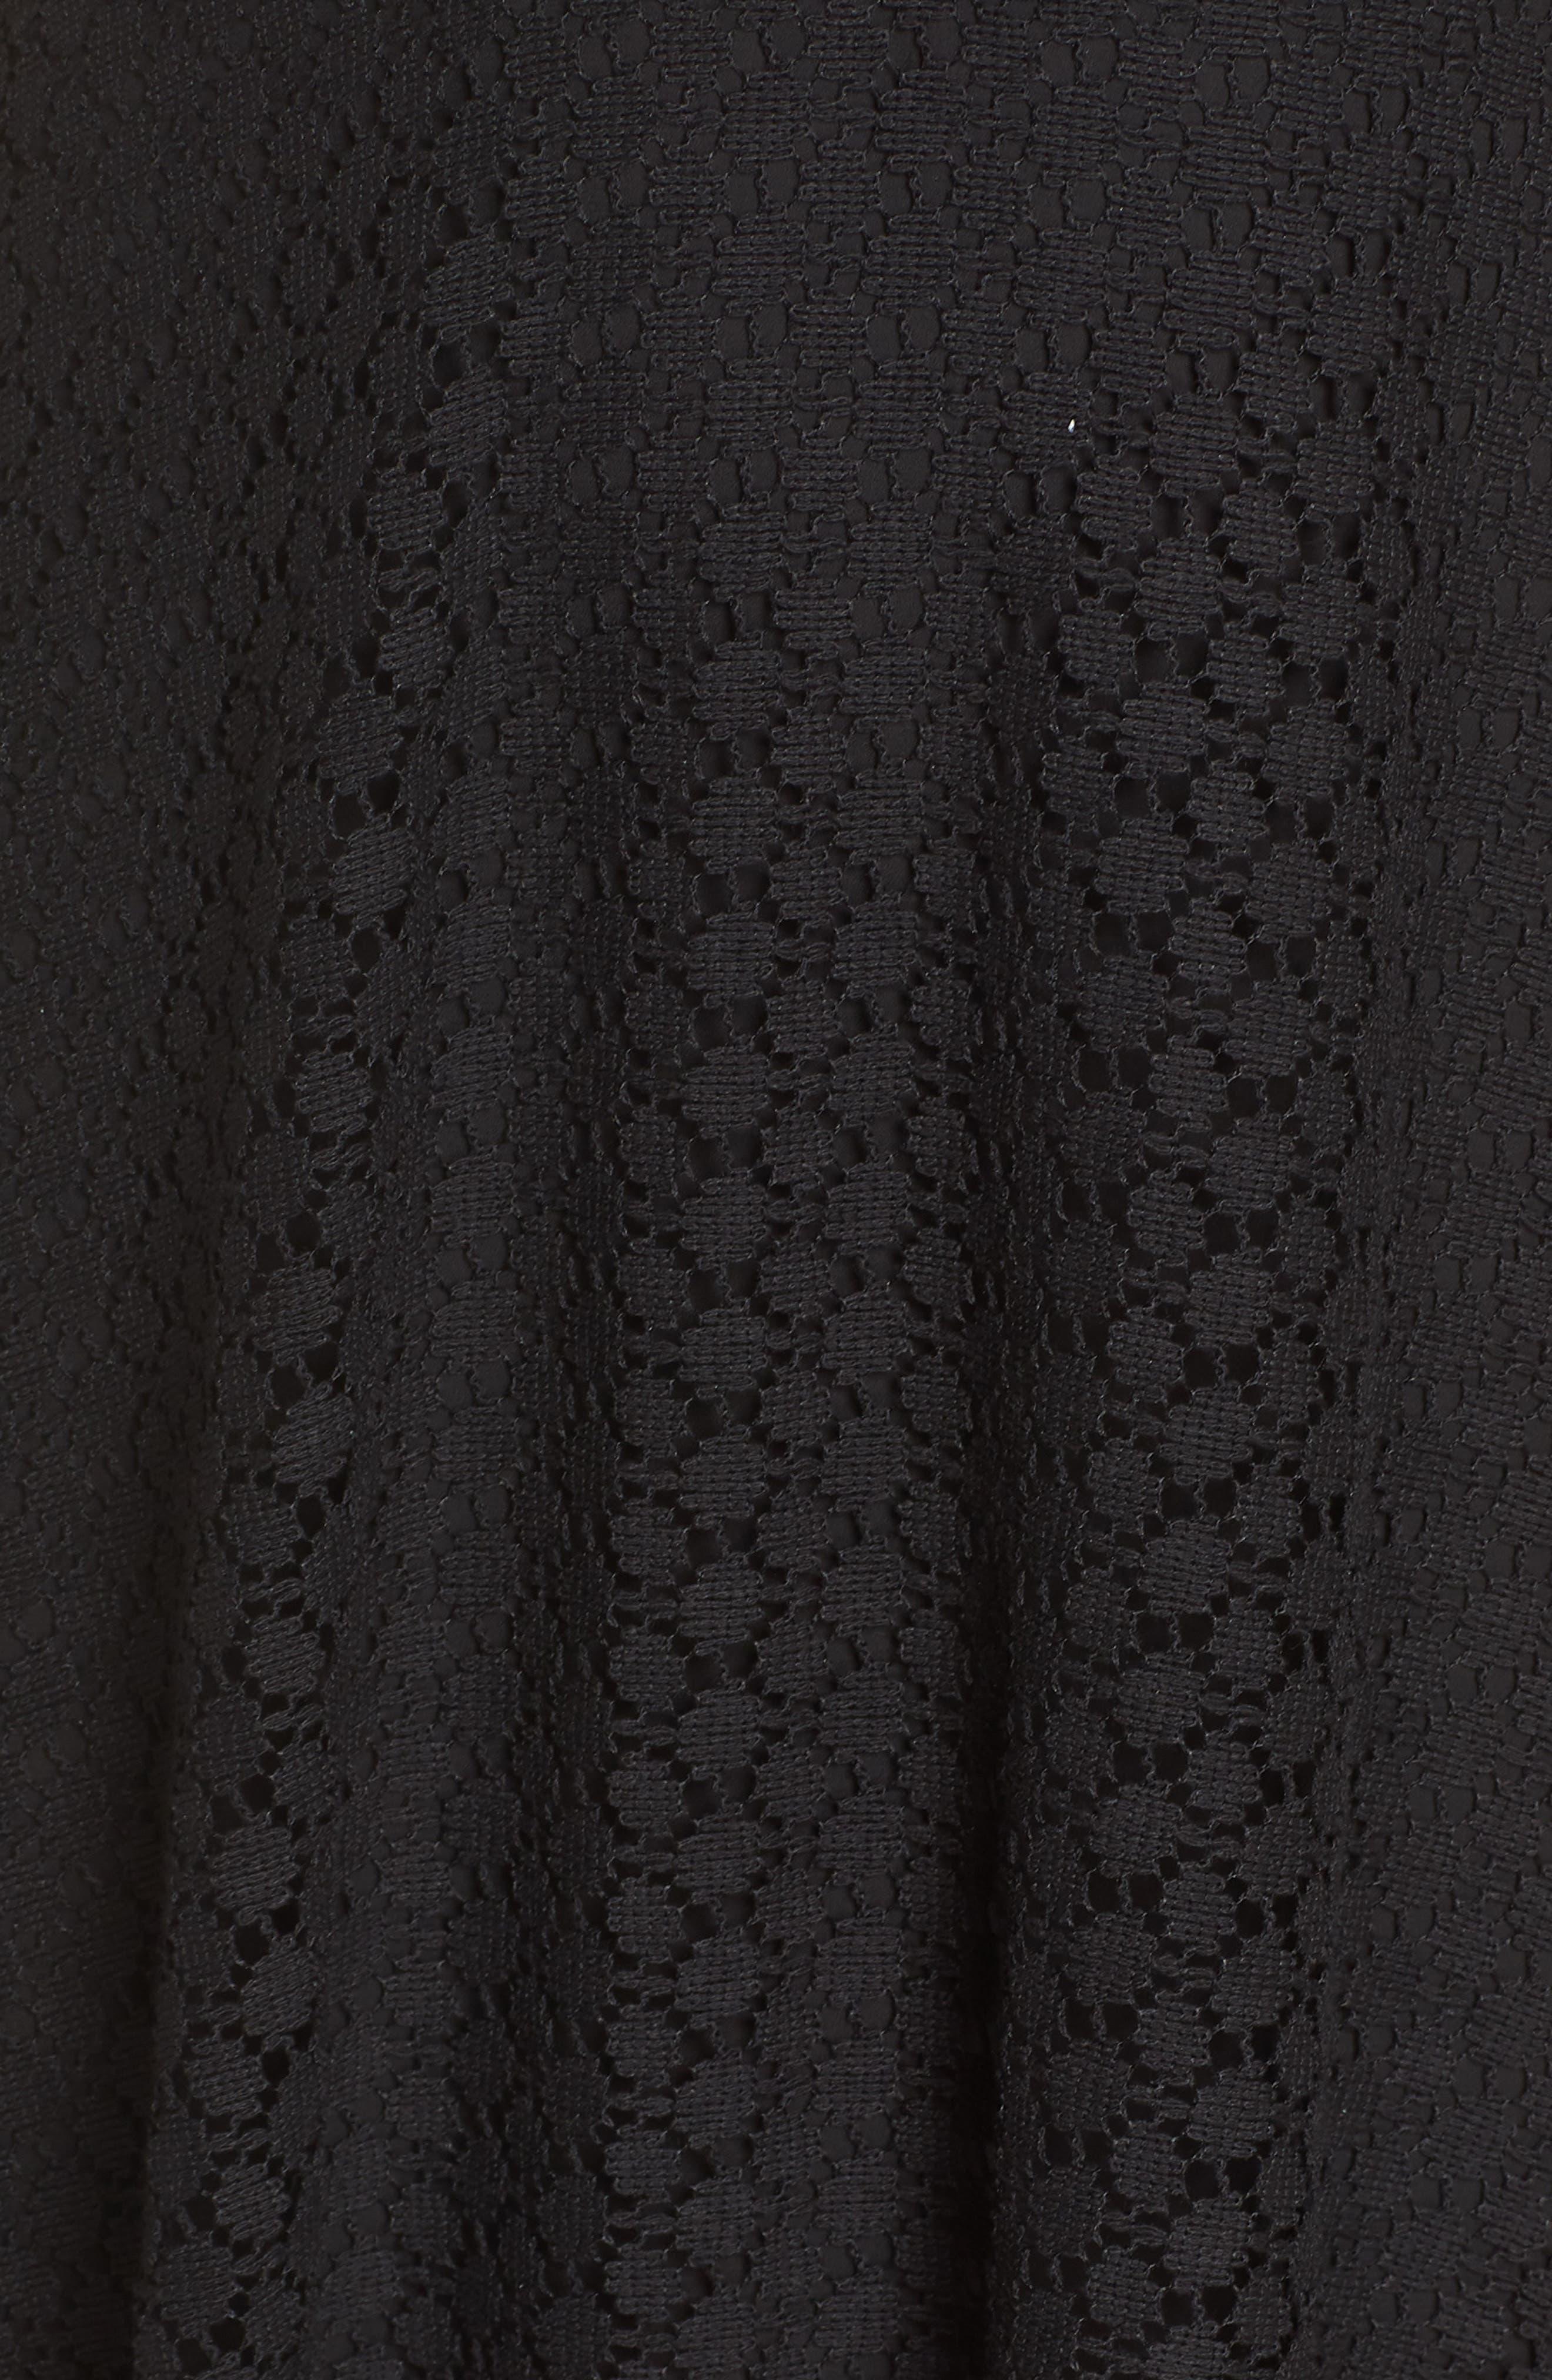 Lace Halter Dress,                             Alternate thumbnail 6, color,                             Black